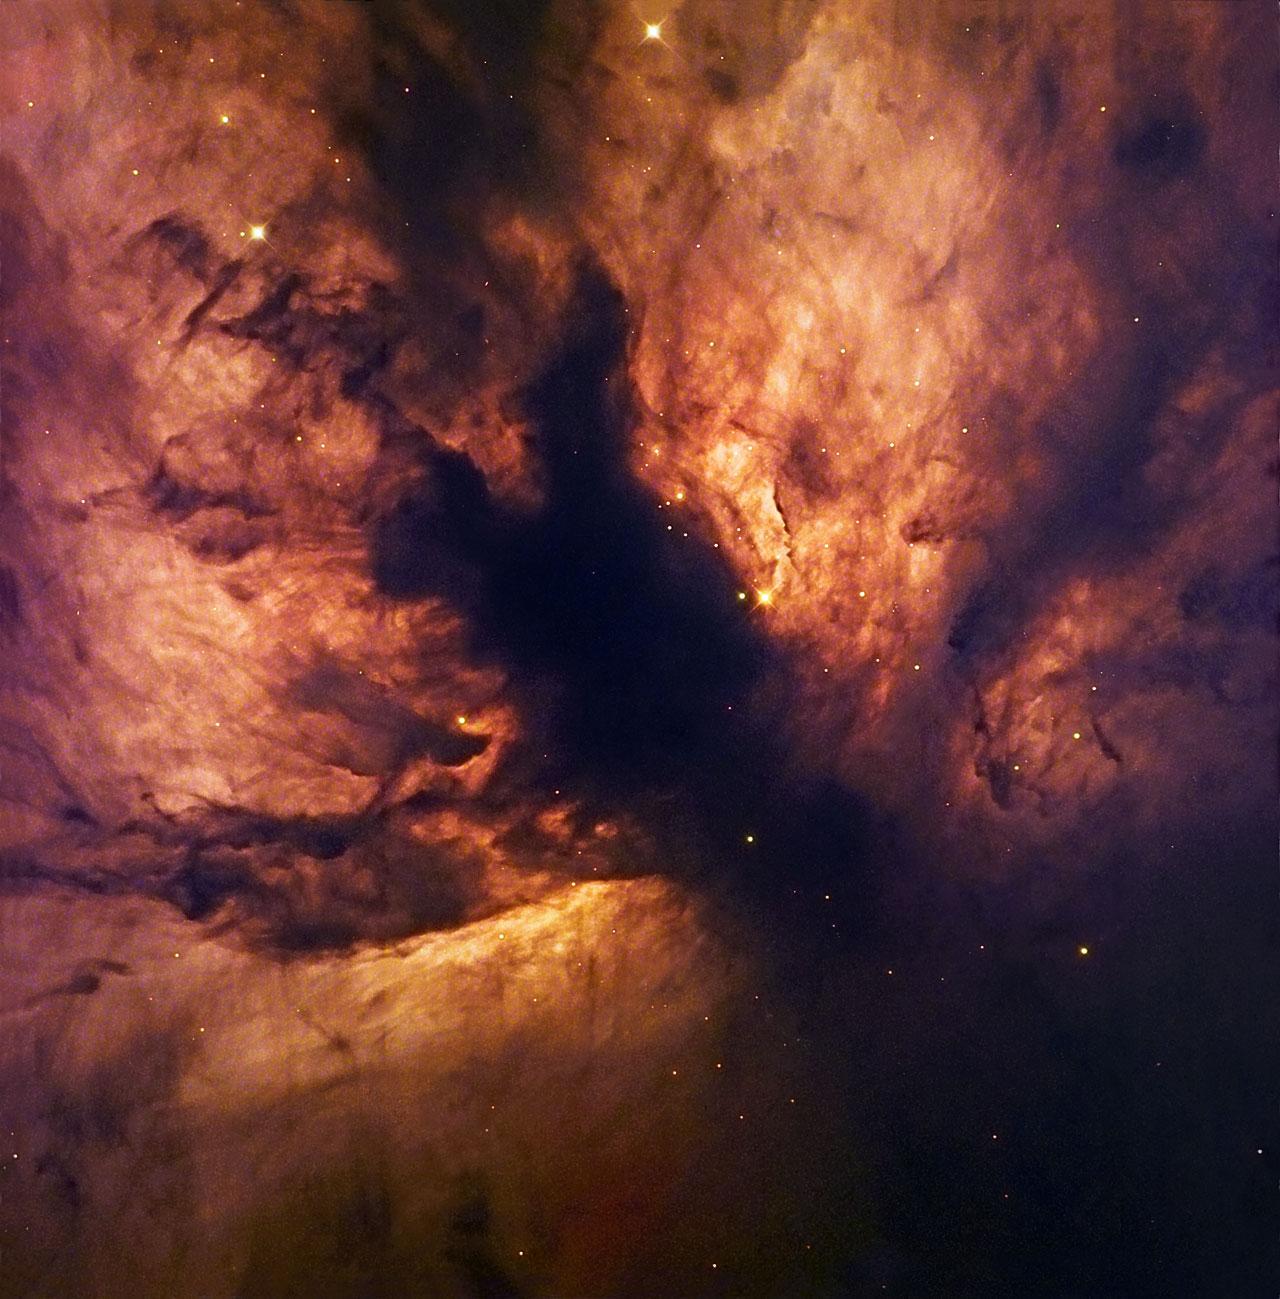 A Cosmic Flame